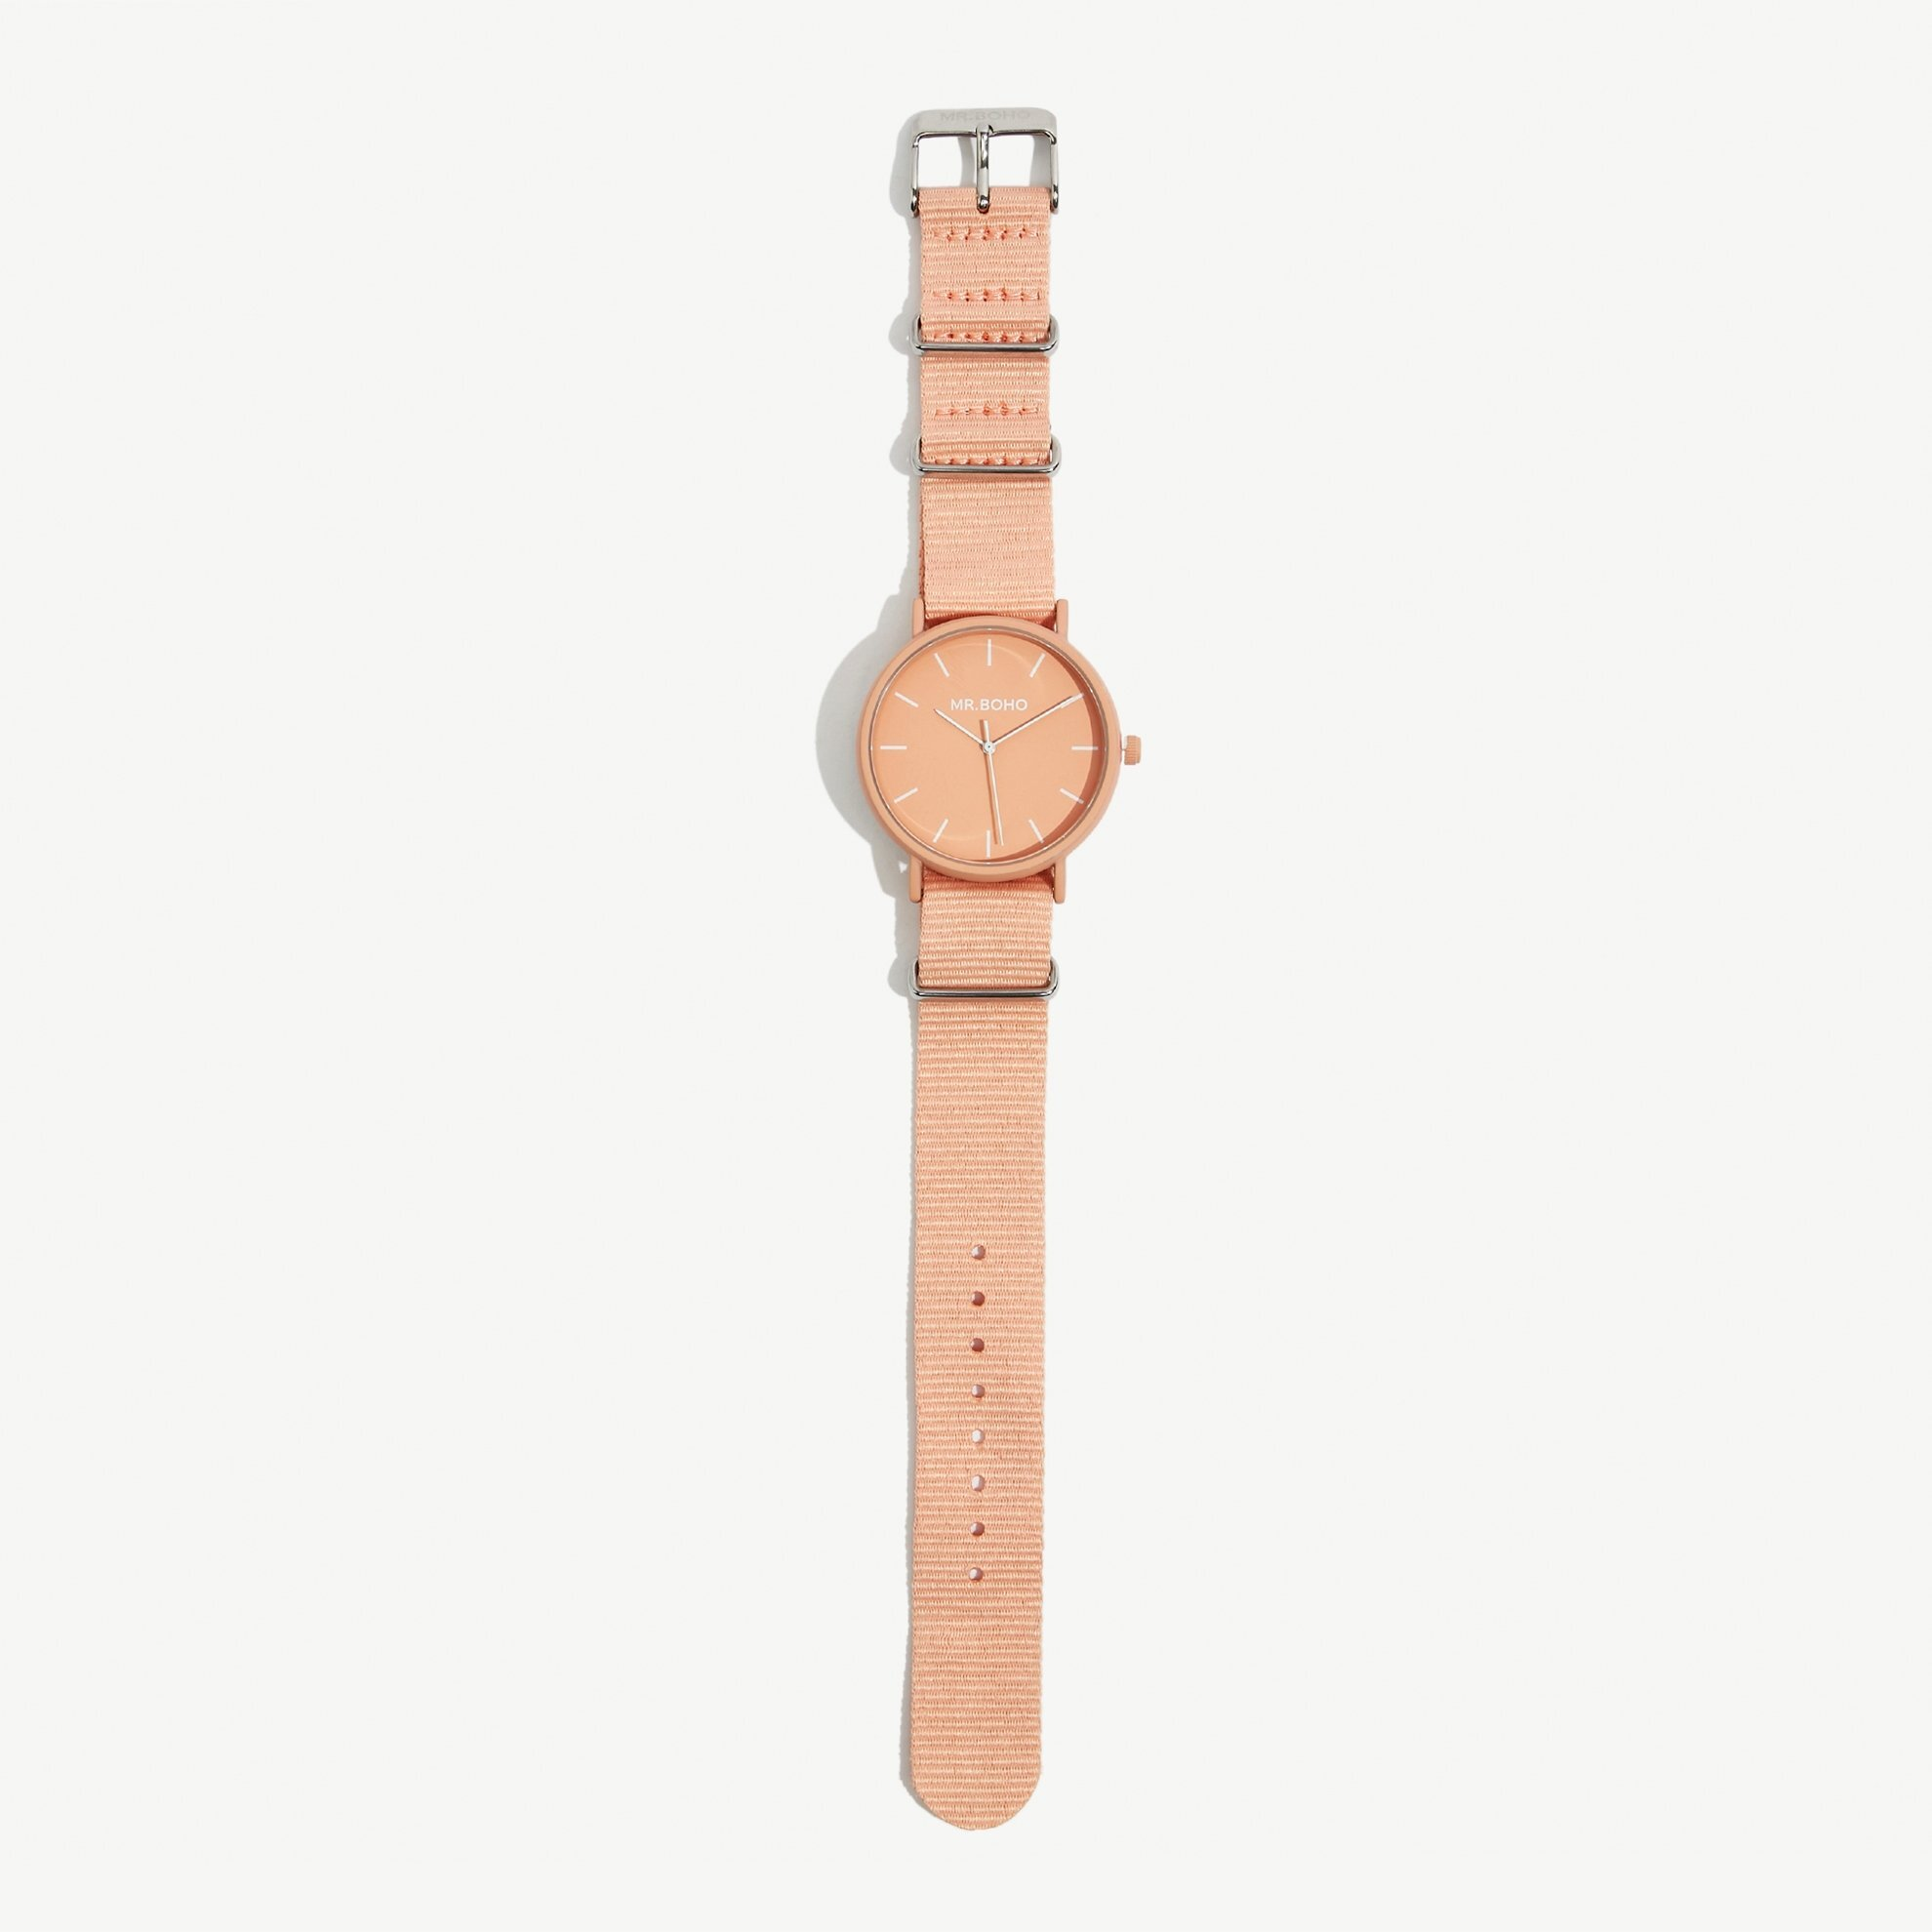 Armbanduhr mit Leinenband